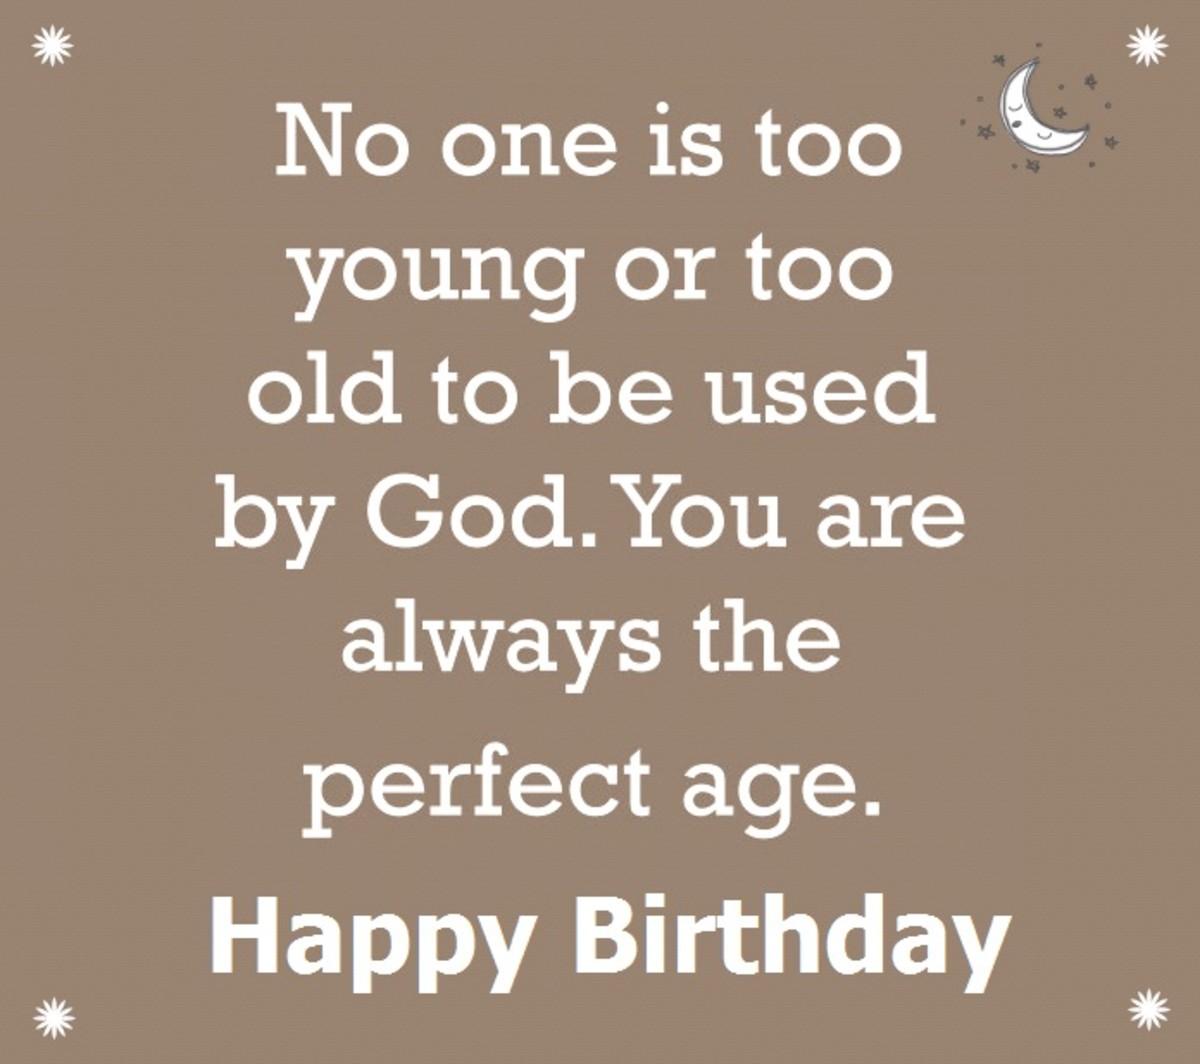 Additional Spiritual Happy Birthday Greetings